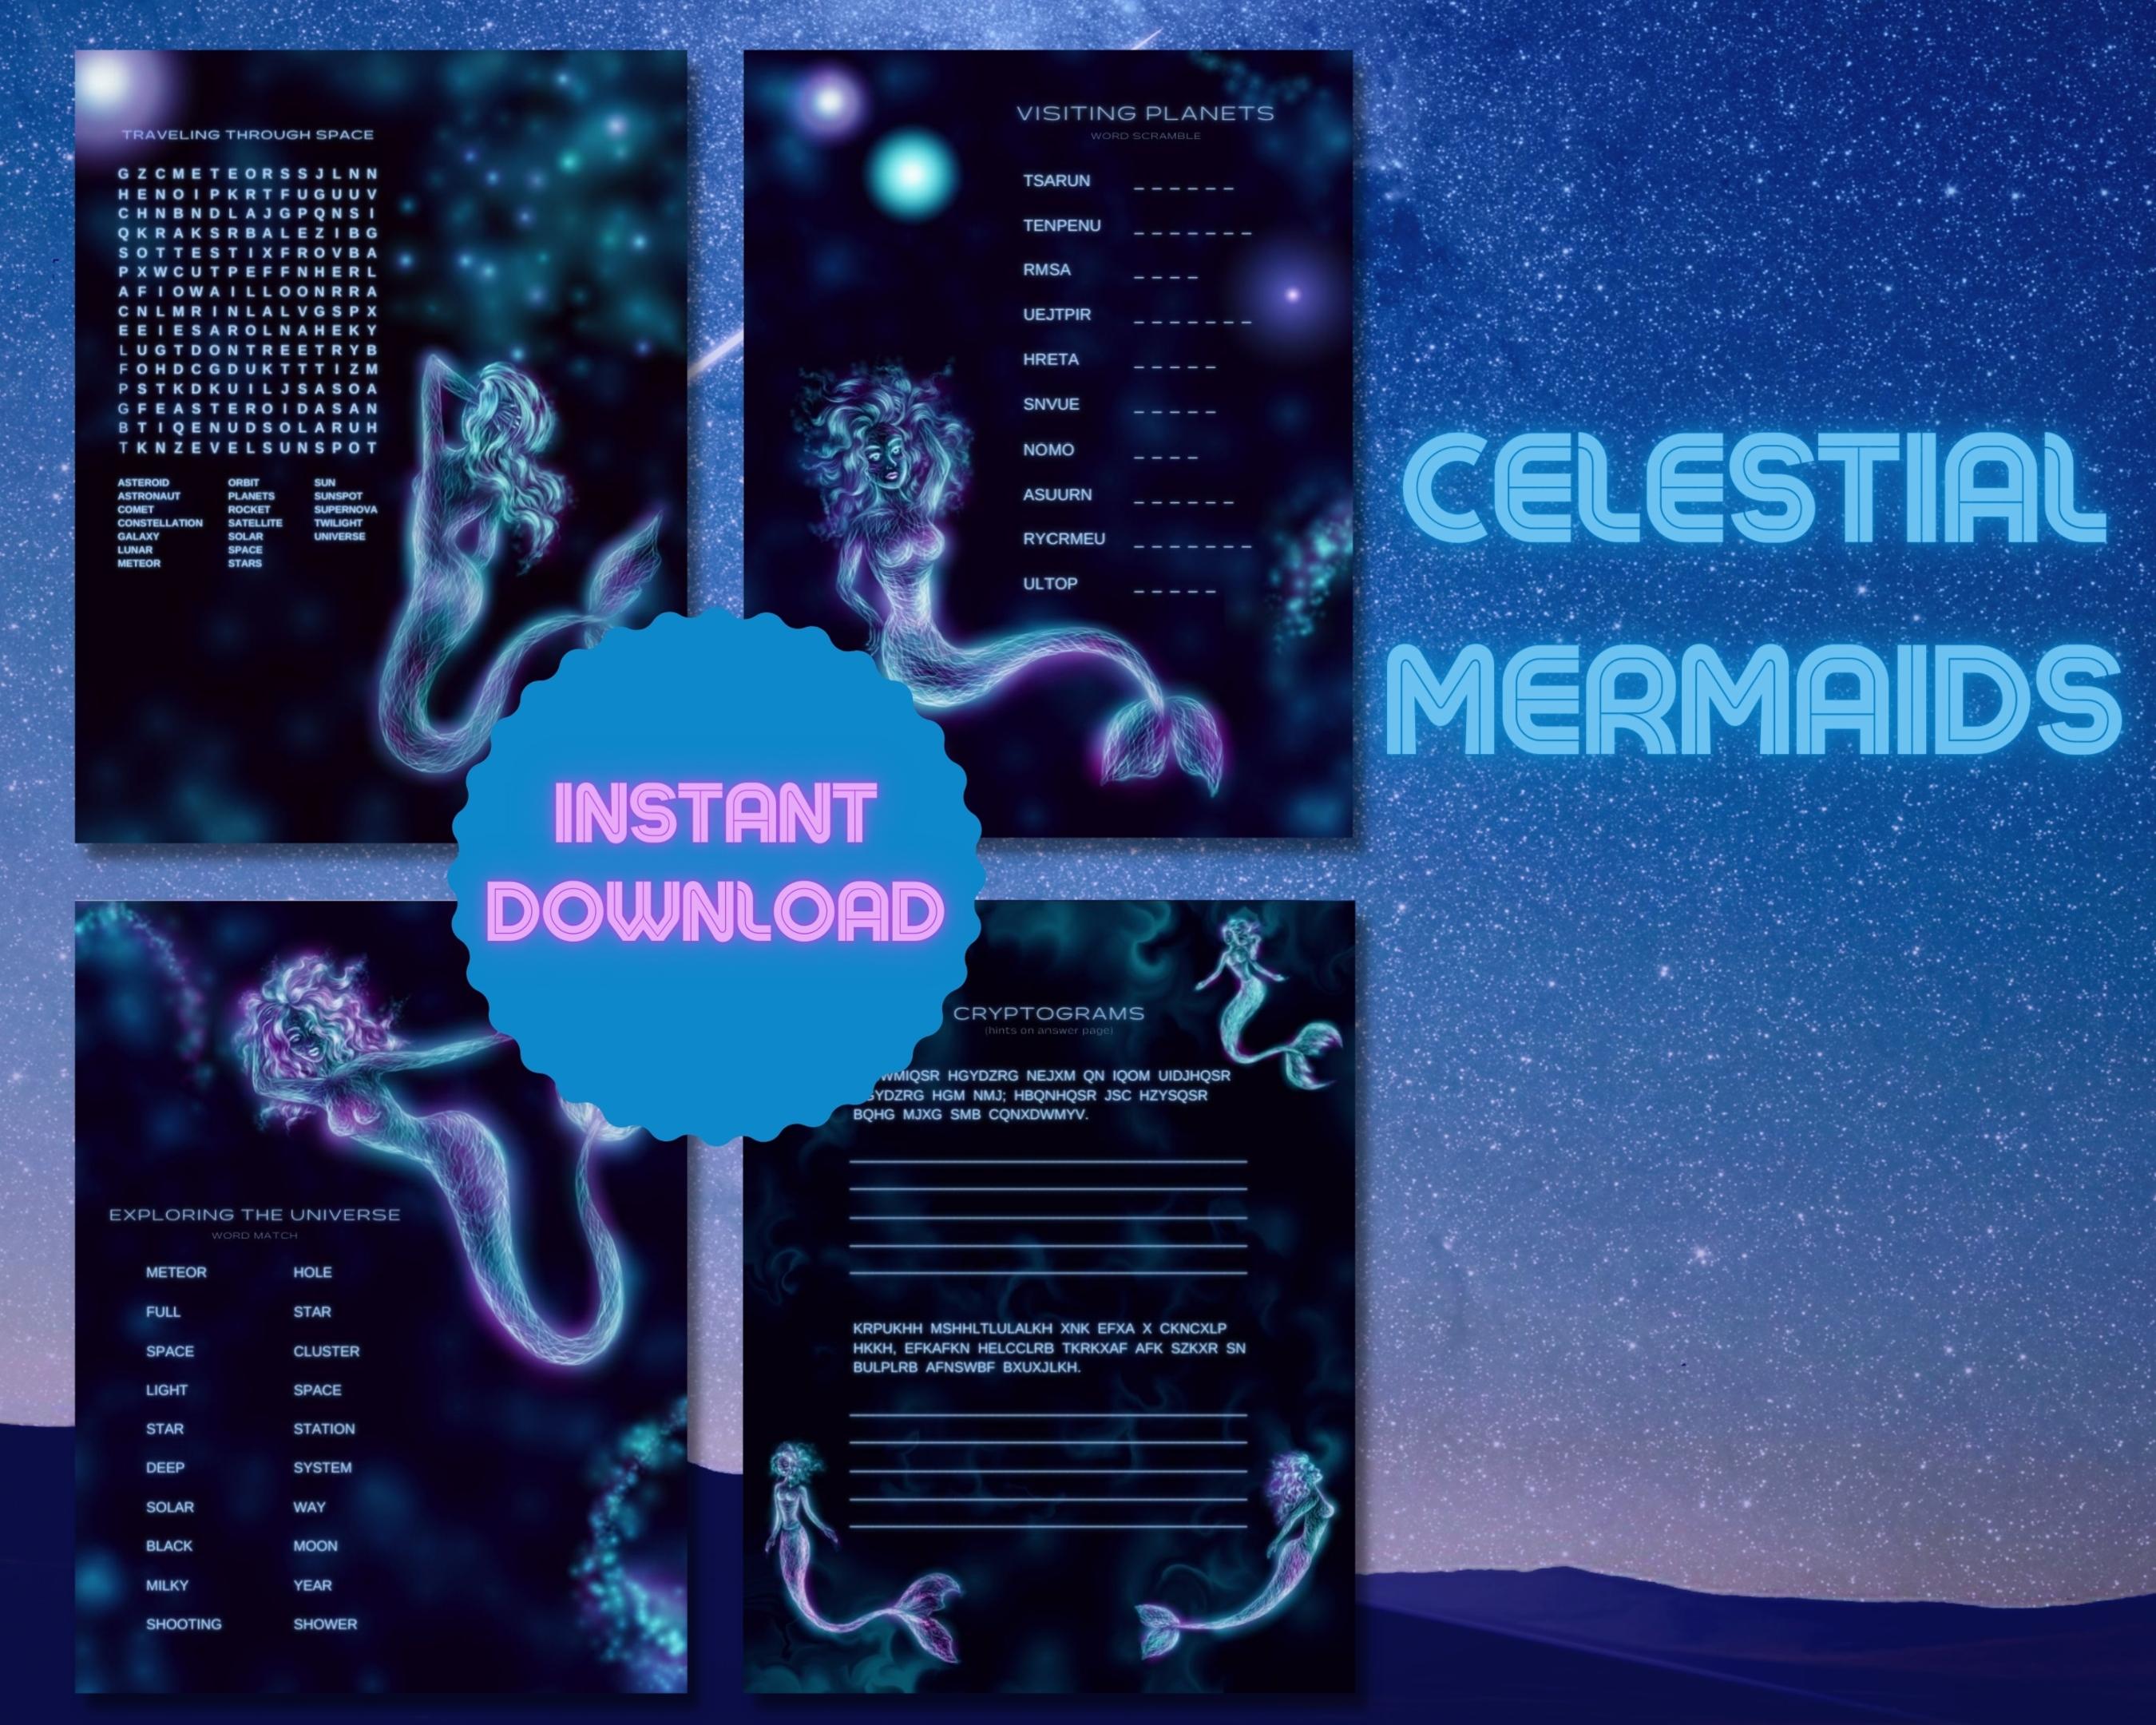 Celestial Mermaids Word Puzzles